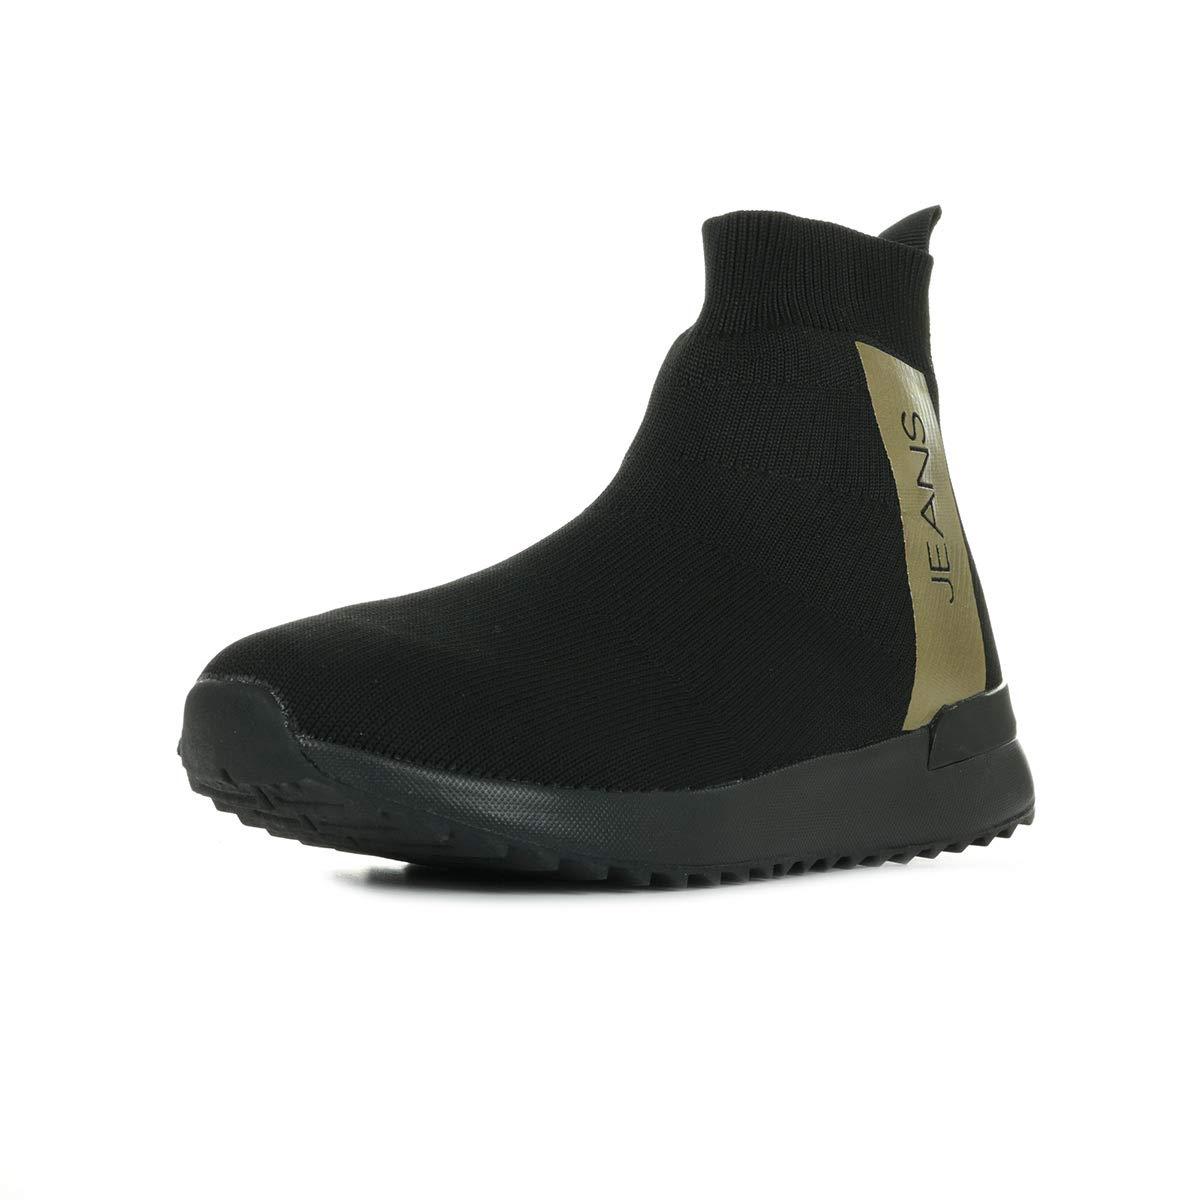 Versace Jeans Linea Turnschuhe Fondo Super Dis. 4 E0VTBSG470947M27 Turnschuhe Linea 1e0238